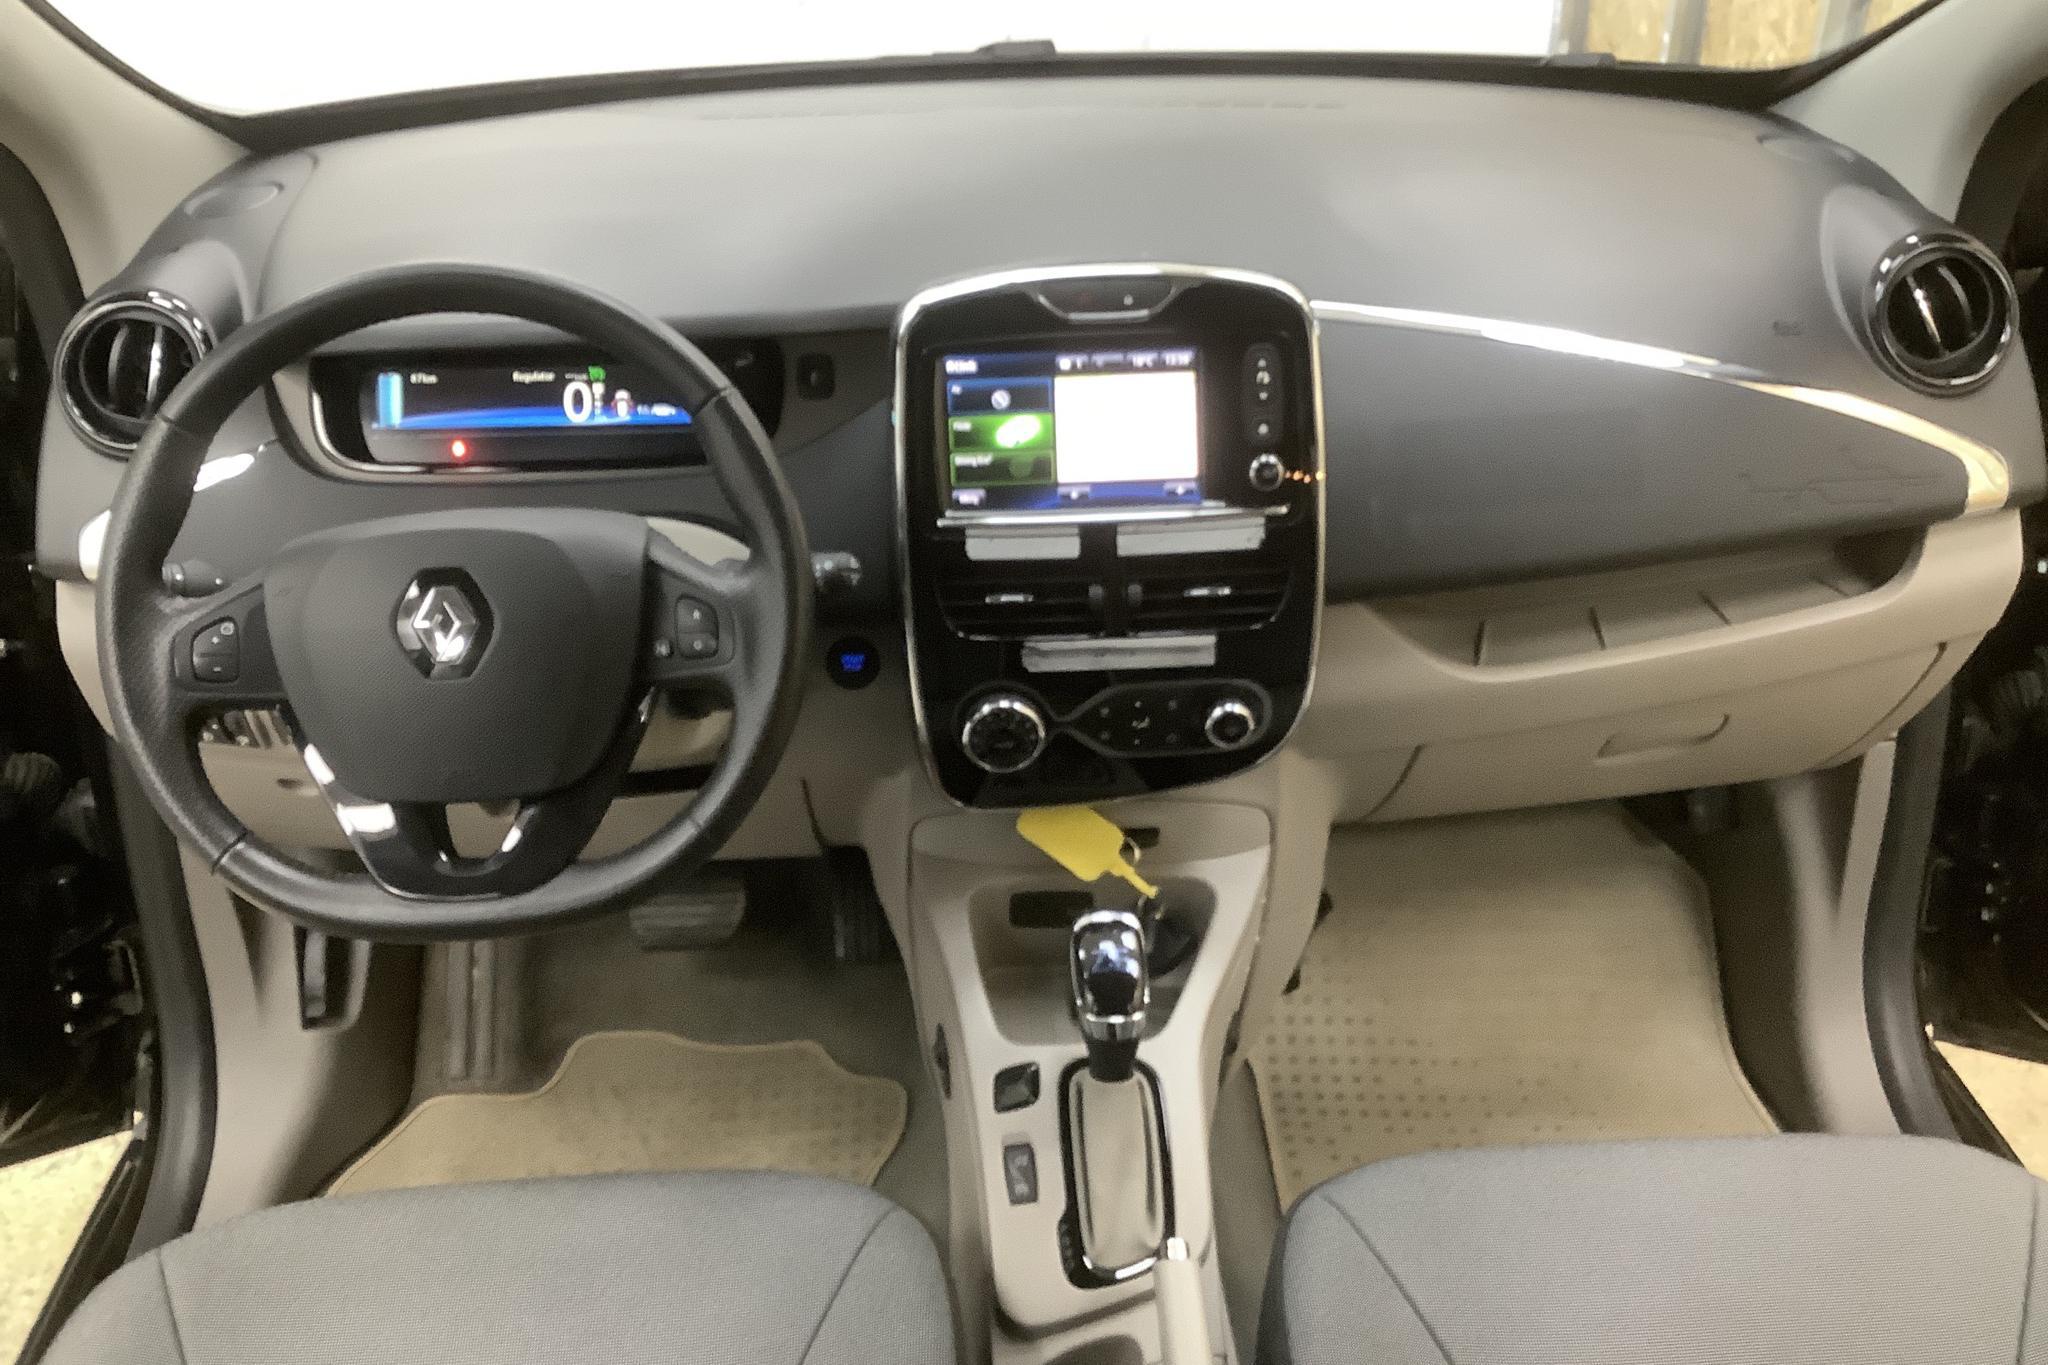 Renault Zoe 22 kWh R88 (88hk) - 2 021 mil - Automat - svart - 2015